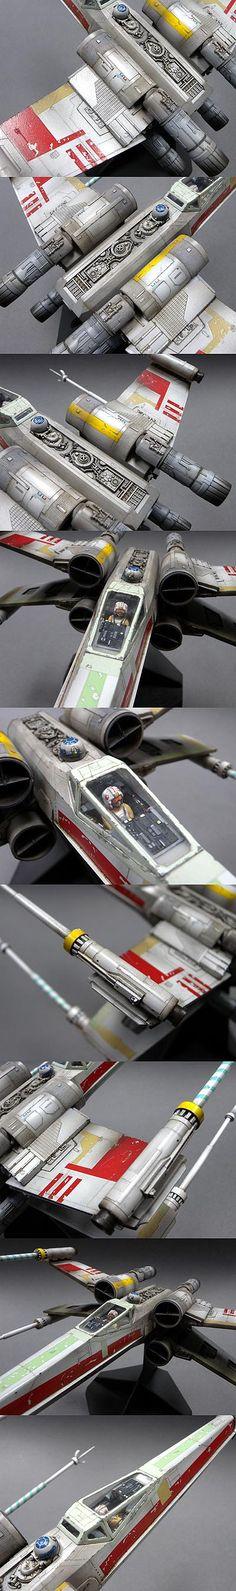 X-Wing 1/32 Scale Model